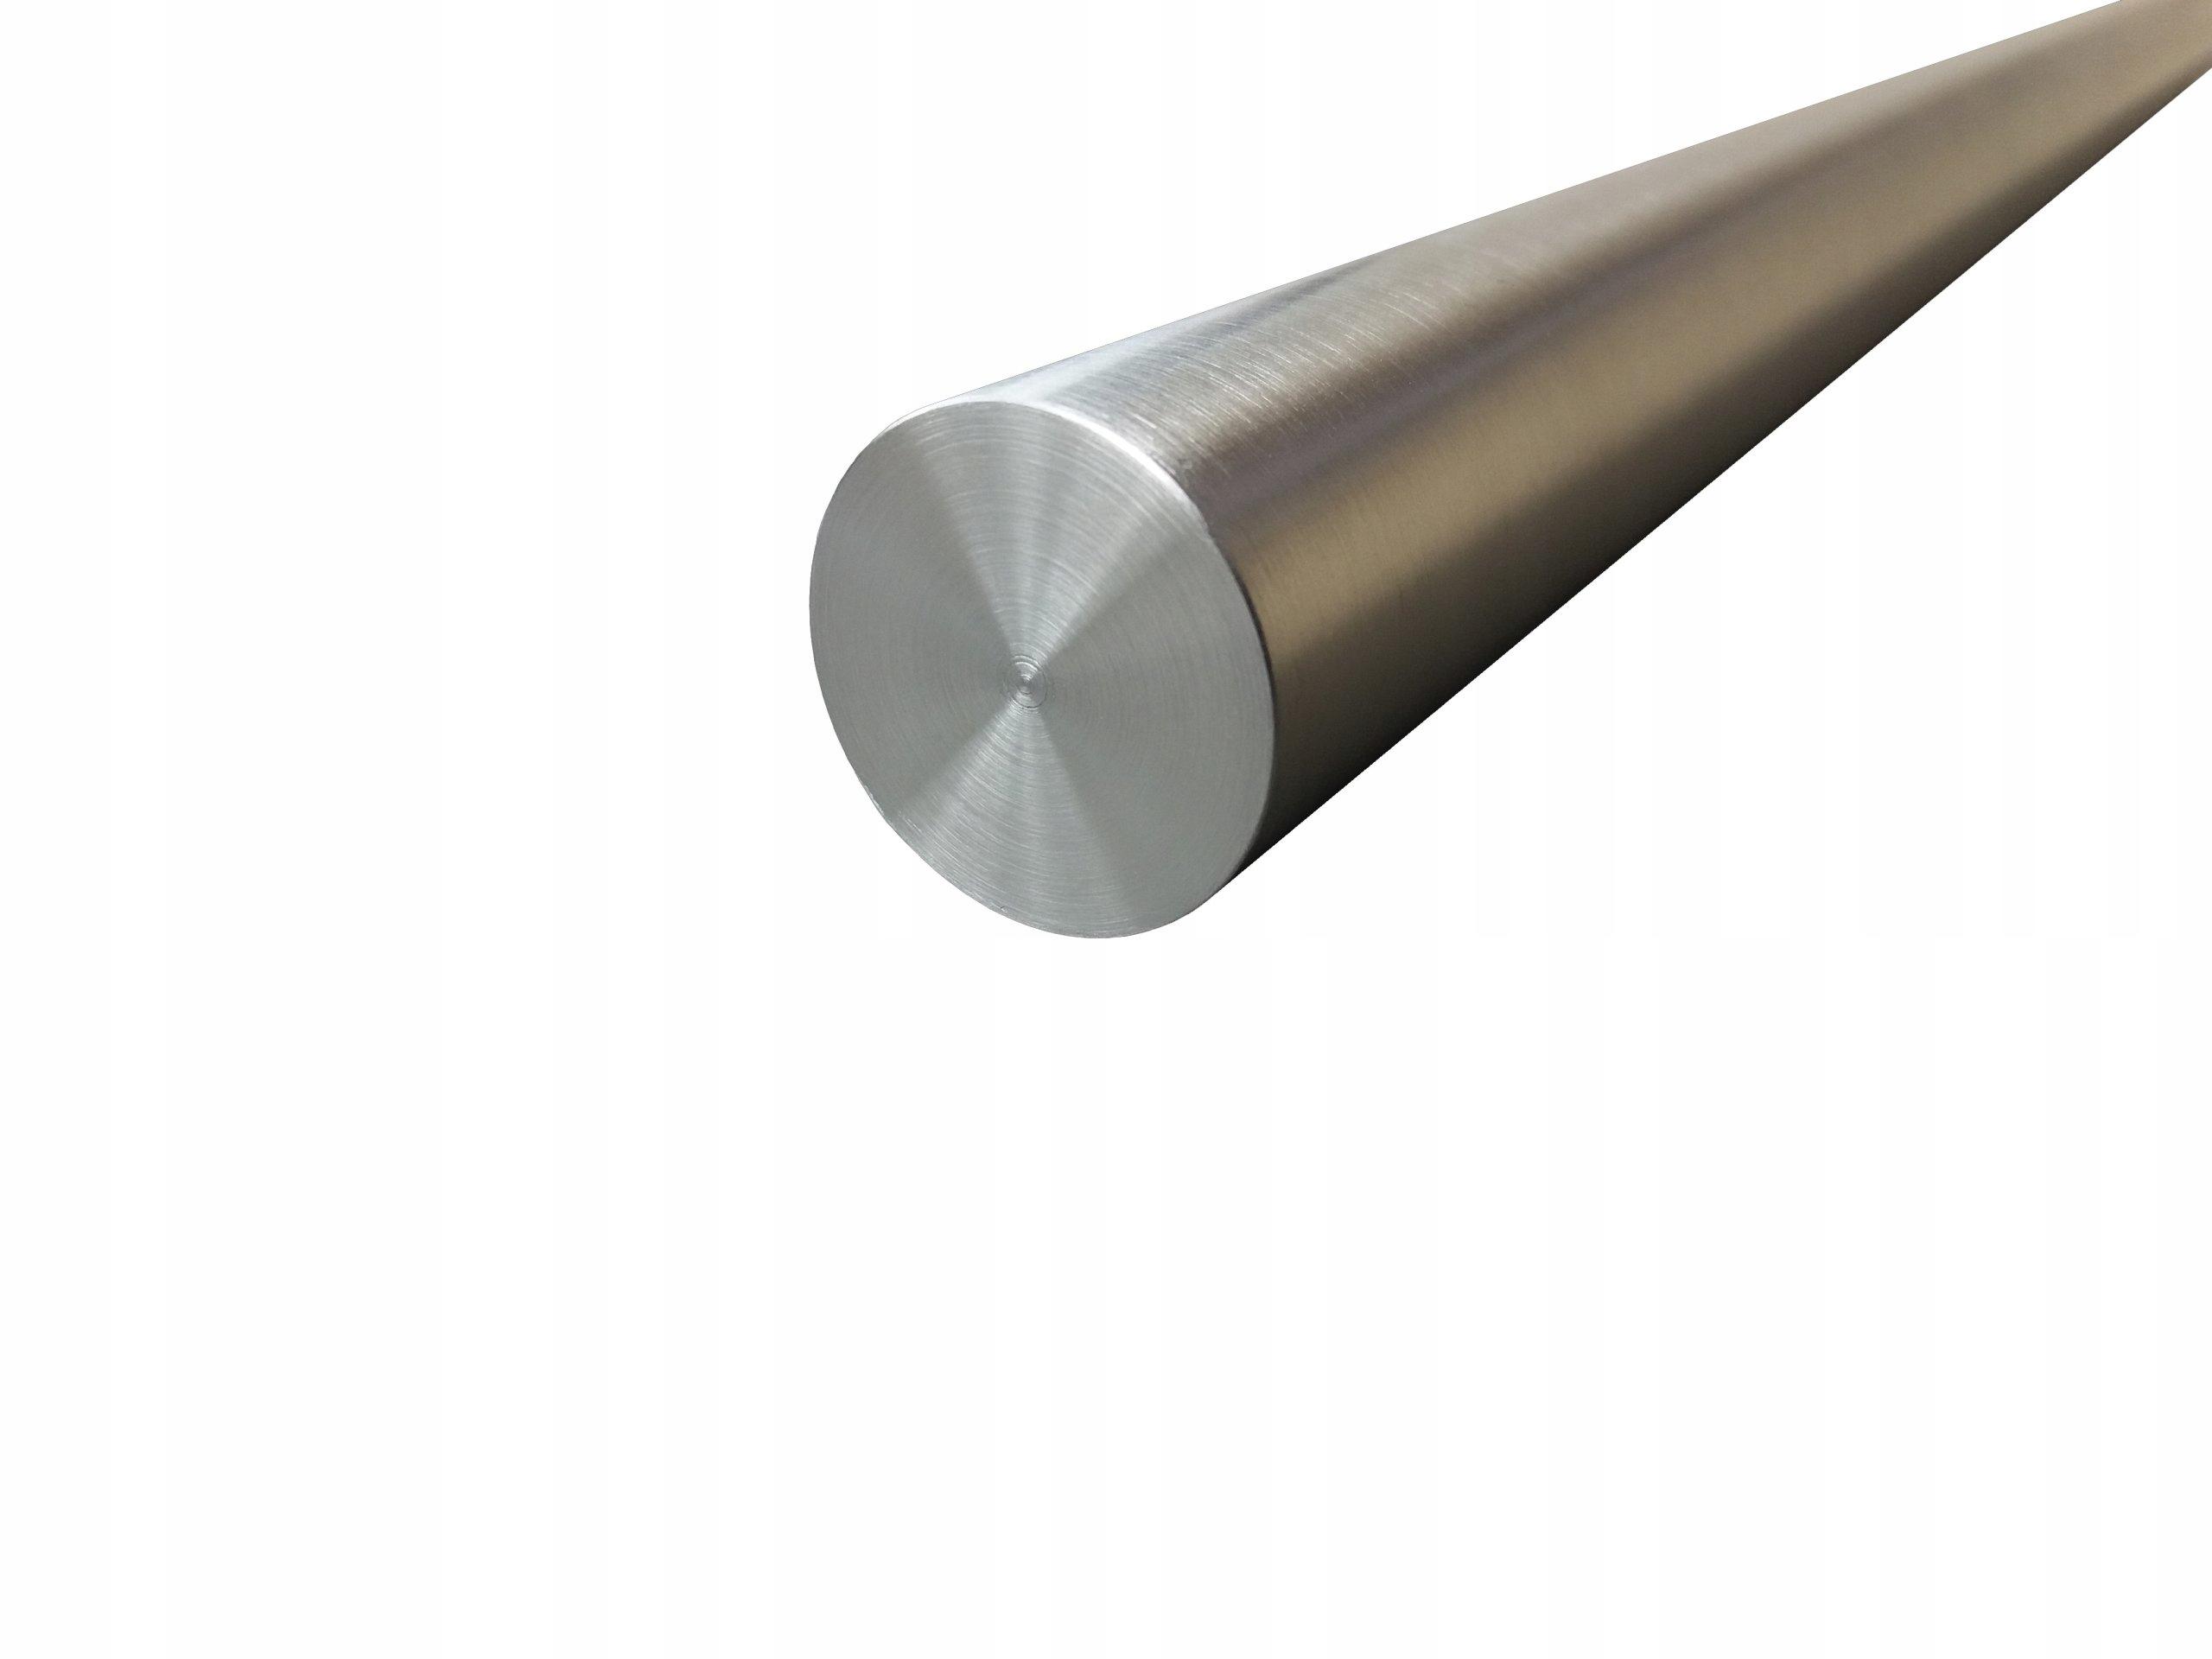 Nerezová oceľová tyčinka 20 mm 100 cm inox